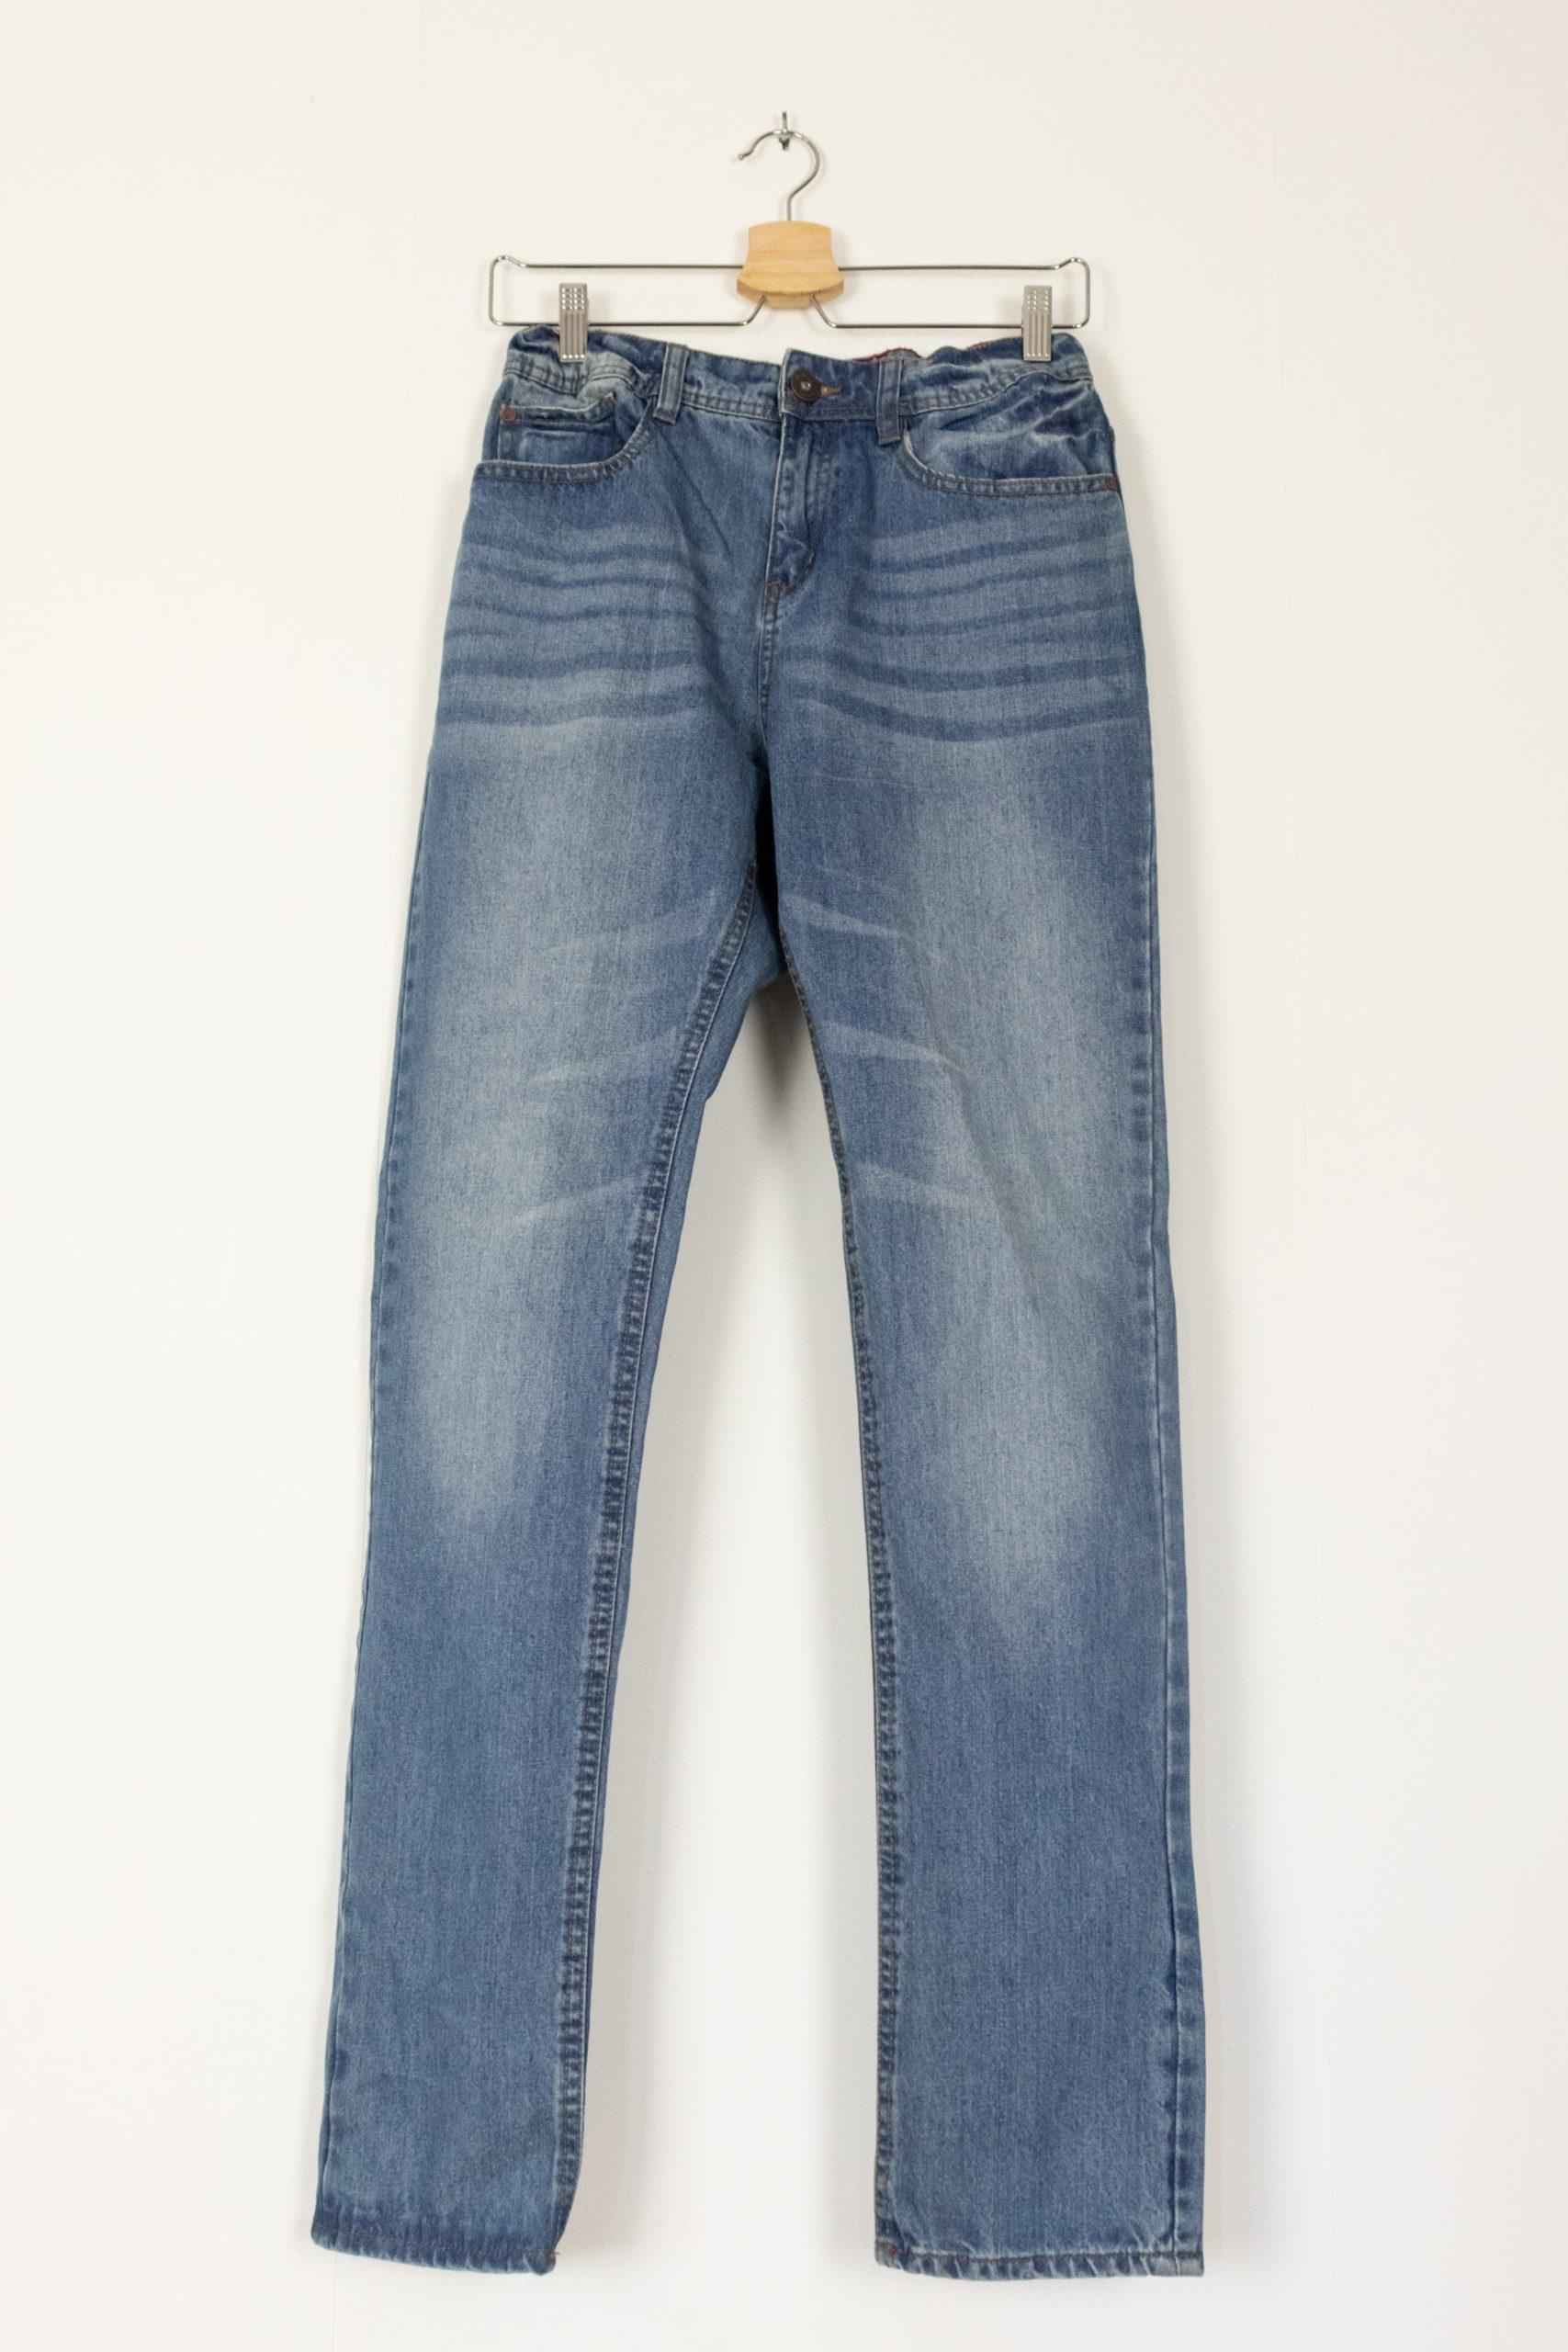 jean slim clair taille haute (3)